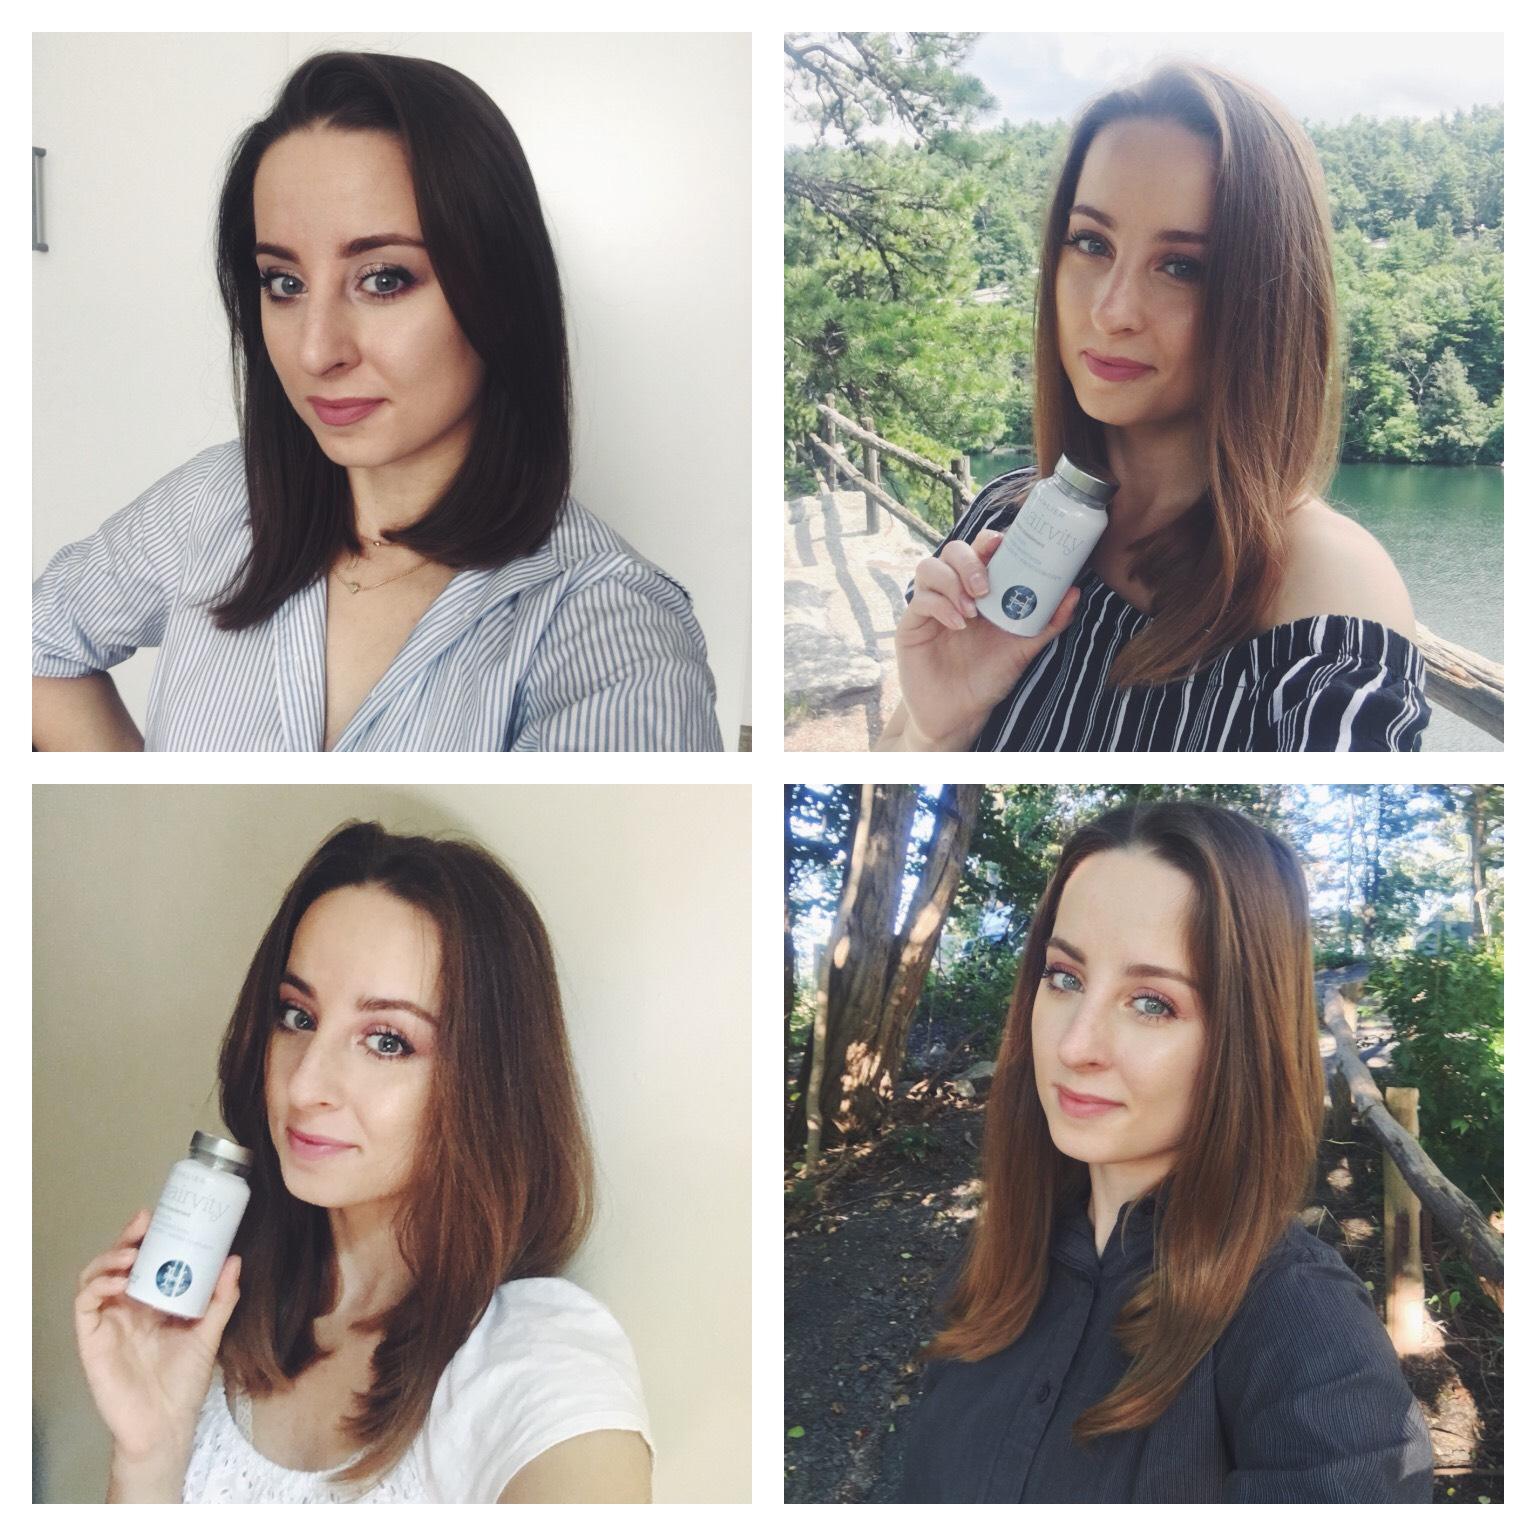 hairvity efekty, hairvity effects, halier, airvity skład, hairvity opinia, hairvity recenzja, hairvity przed i po,